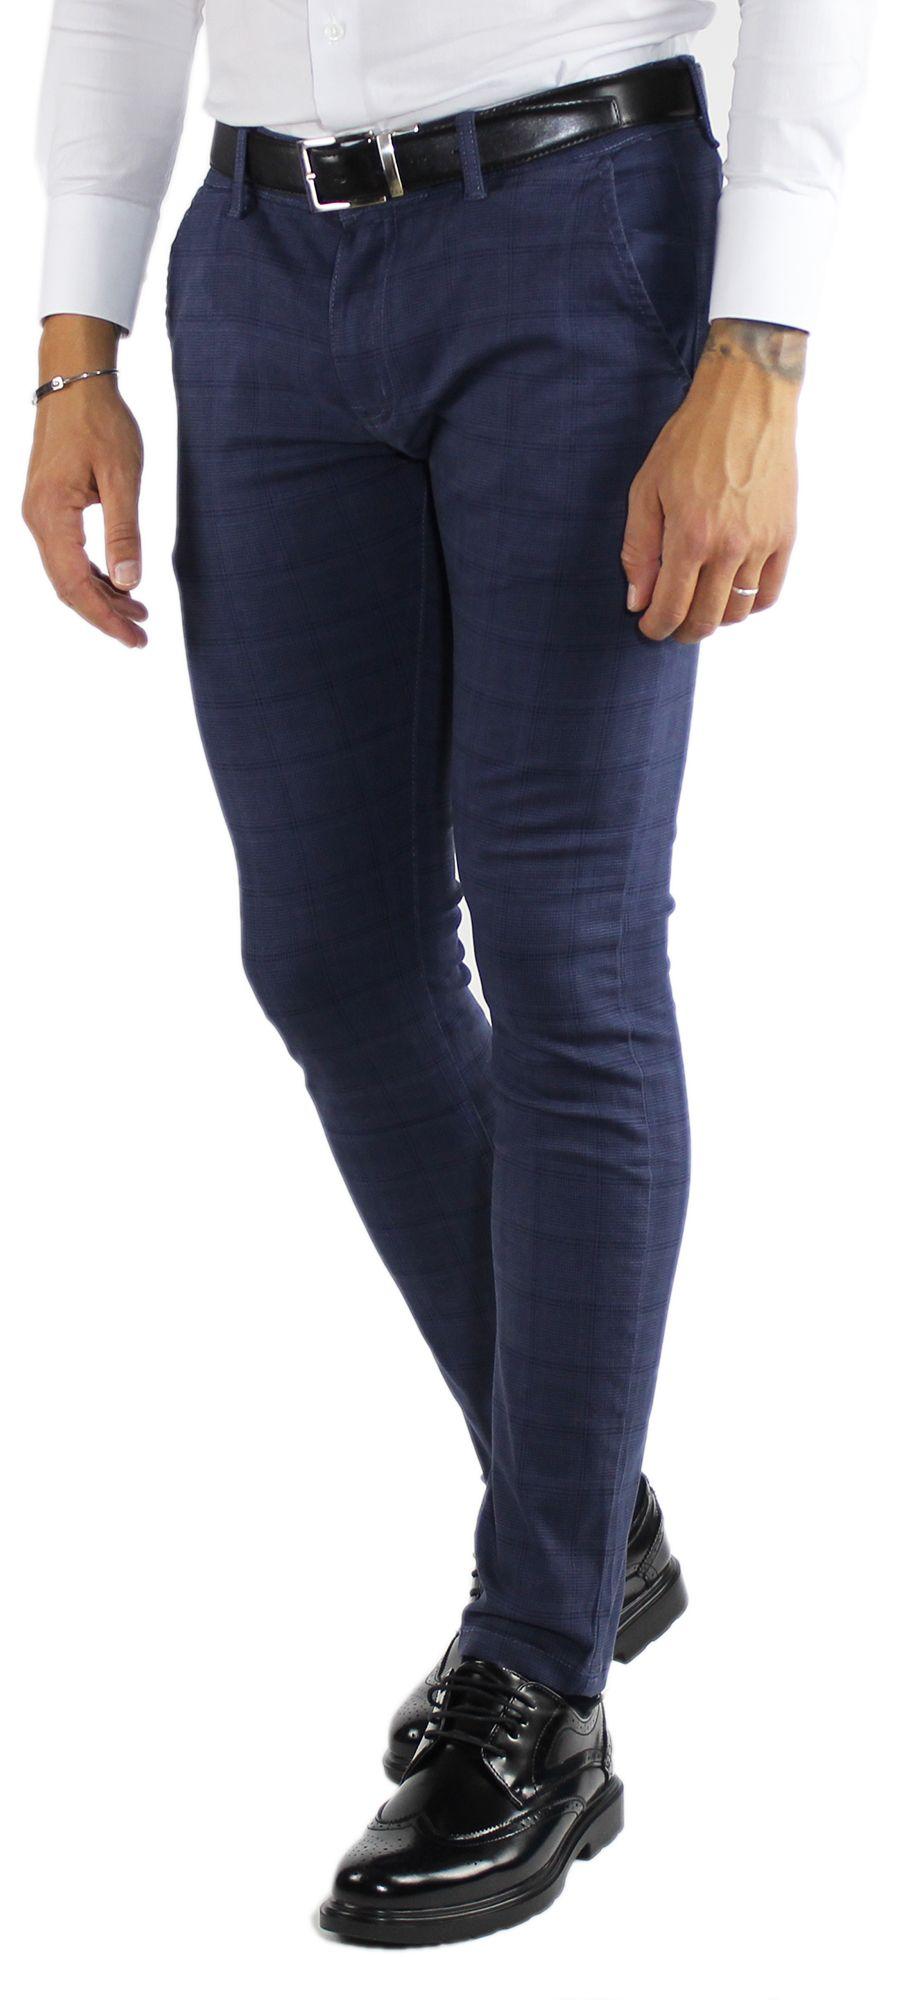 Pantaloni-Uomo-Invernali-a-Quadri-Eleganti-Pantalone-Slim-Fit-Elasticizzati-Scoz miniatura 13